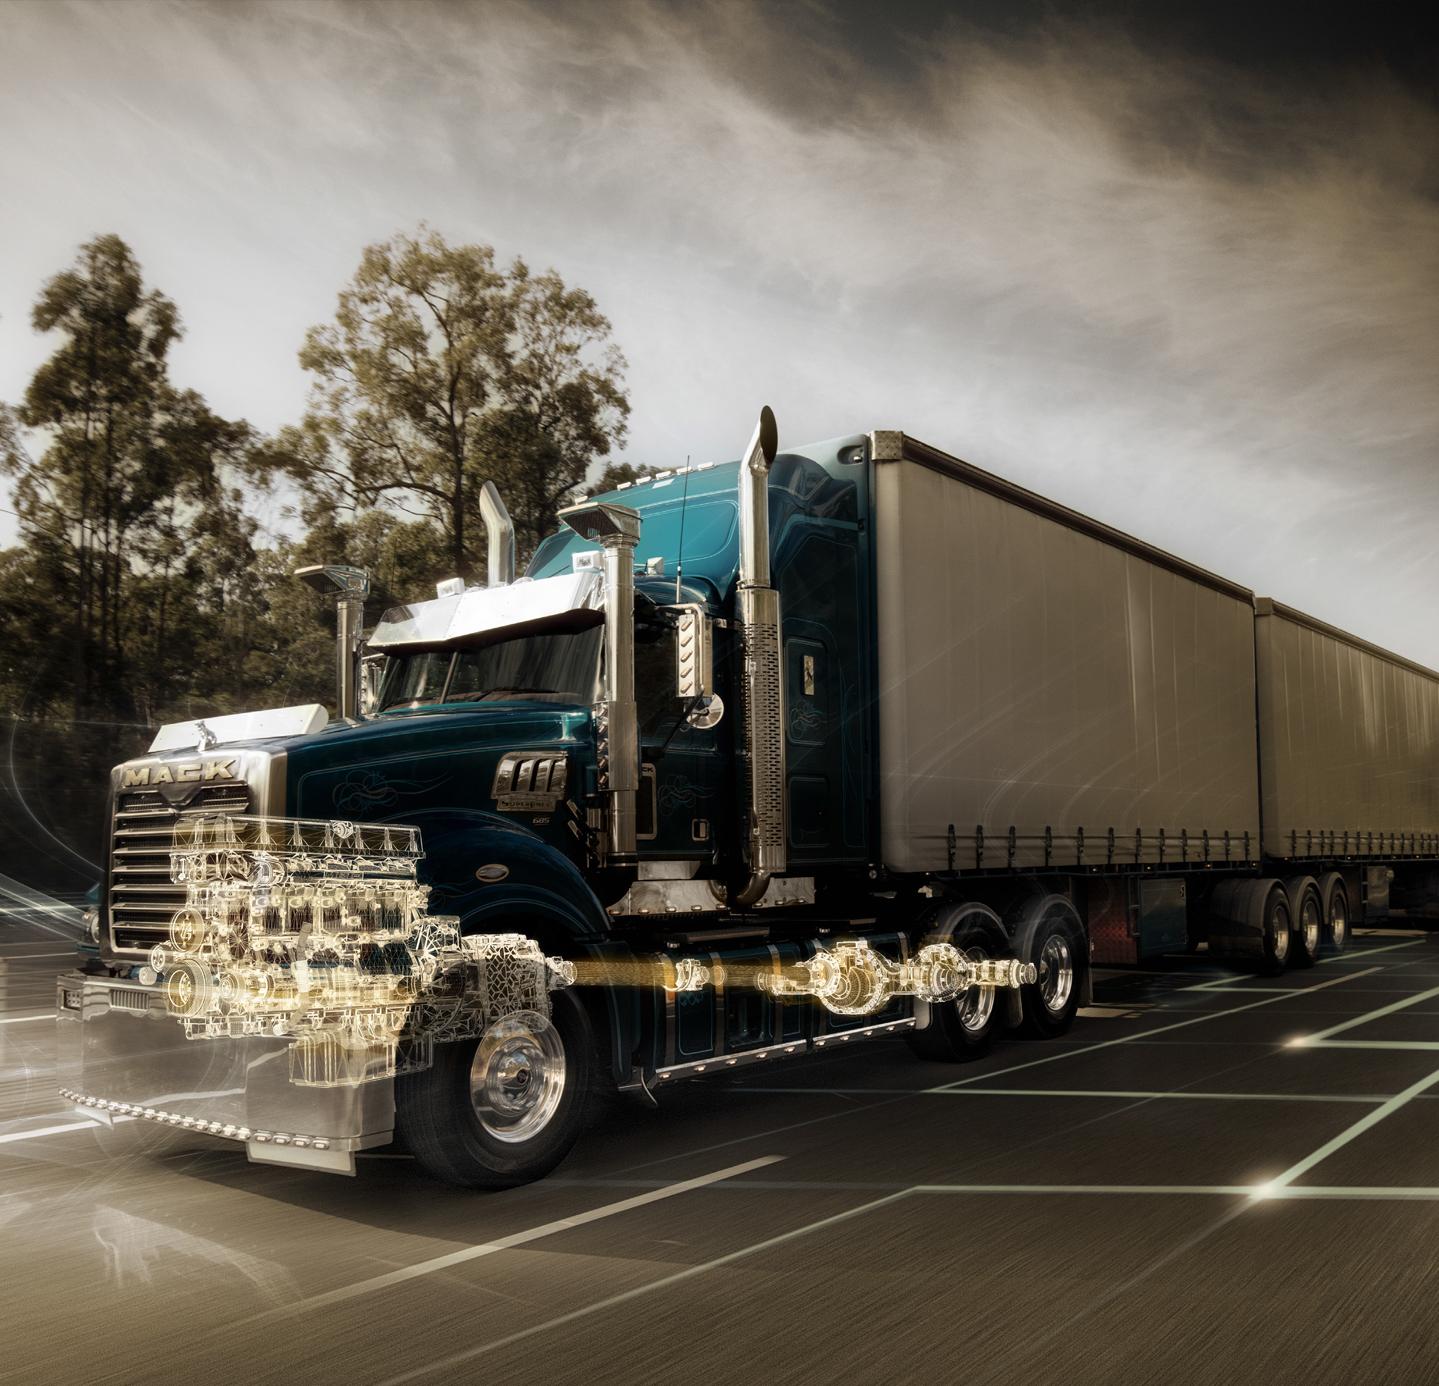 Mack Trucks - Powertrain